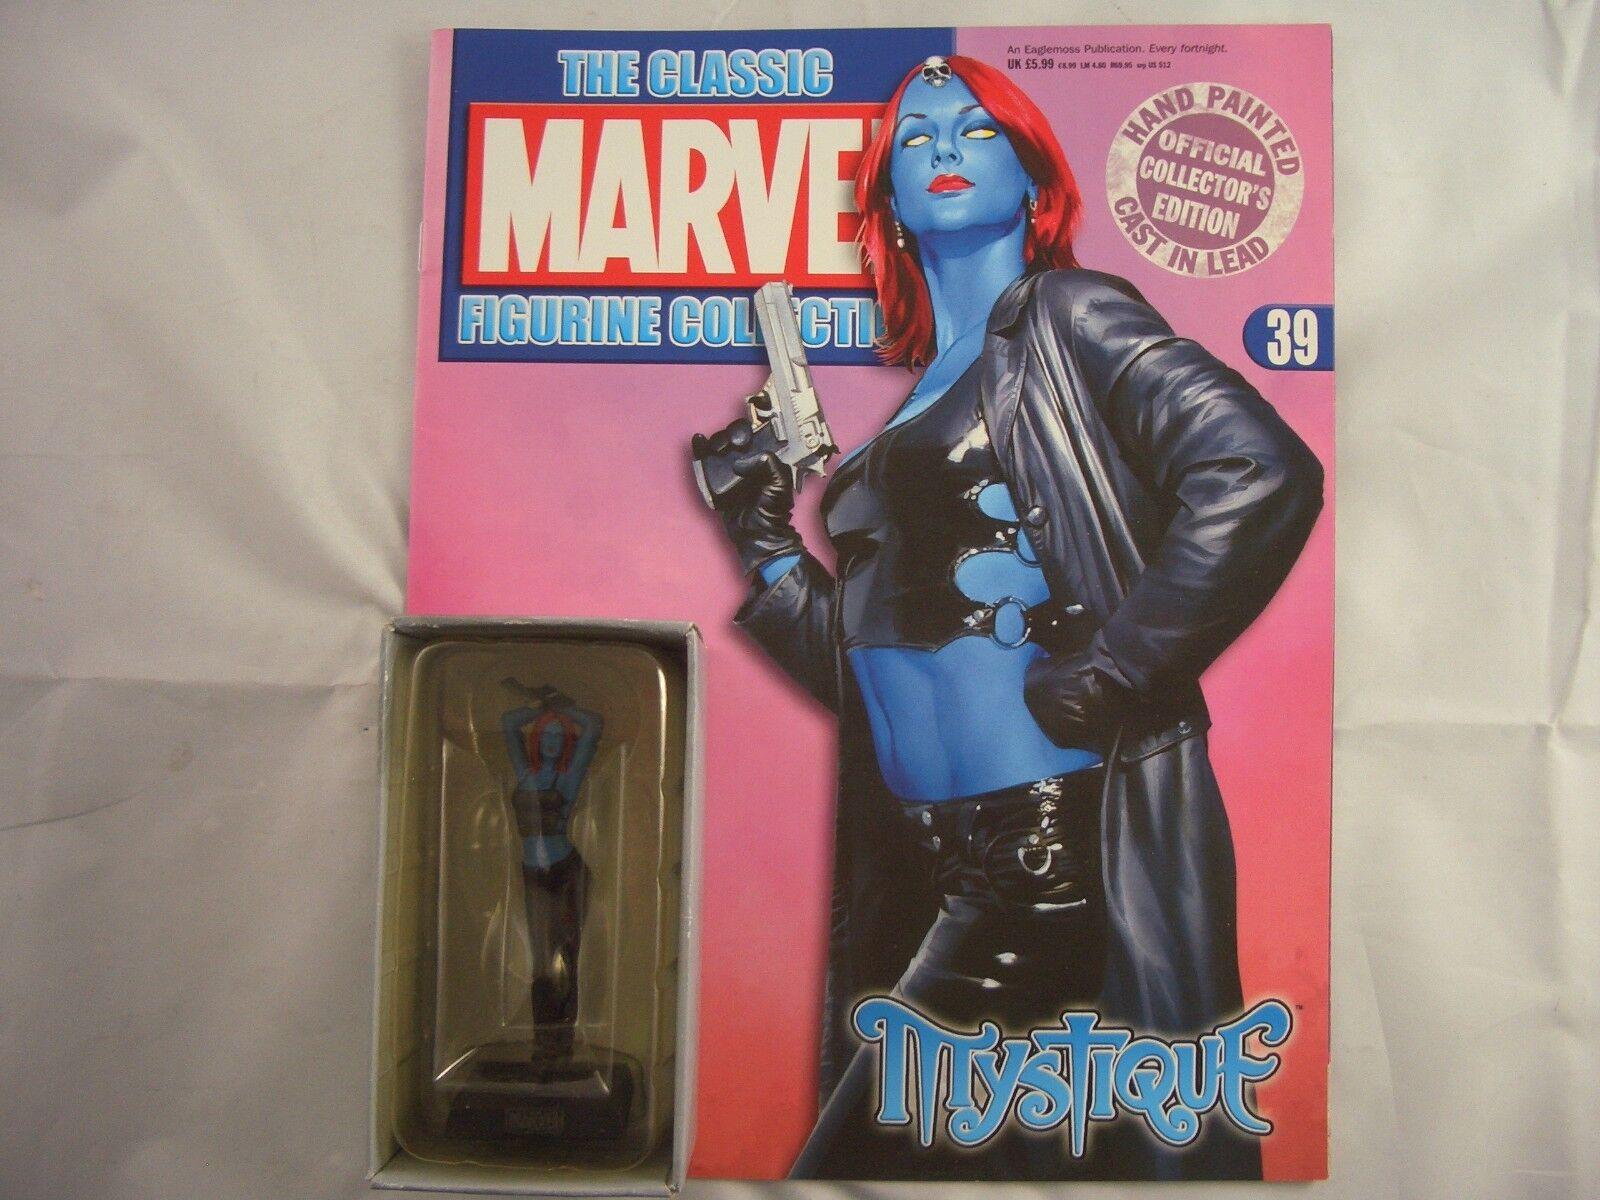 Eaglemoss 39 Marvel Figurine Collection Mystique with magazine 39 Eaglemoss aa7c54